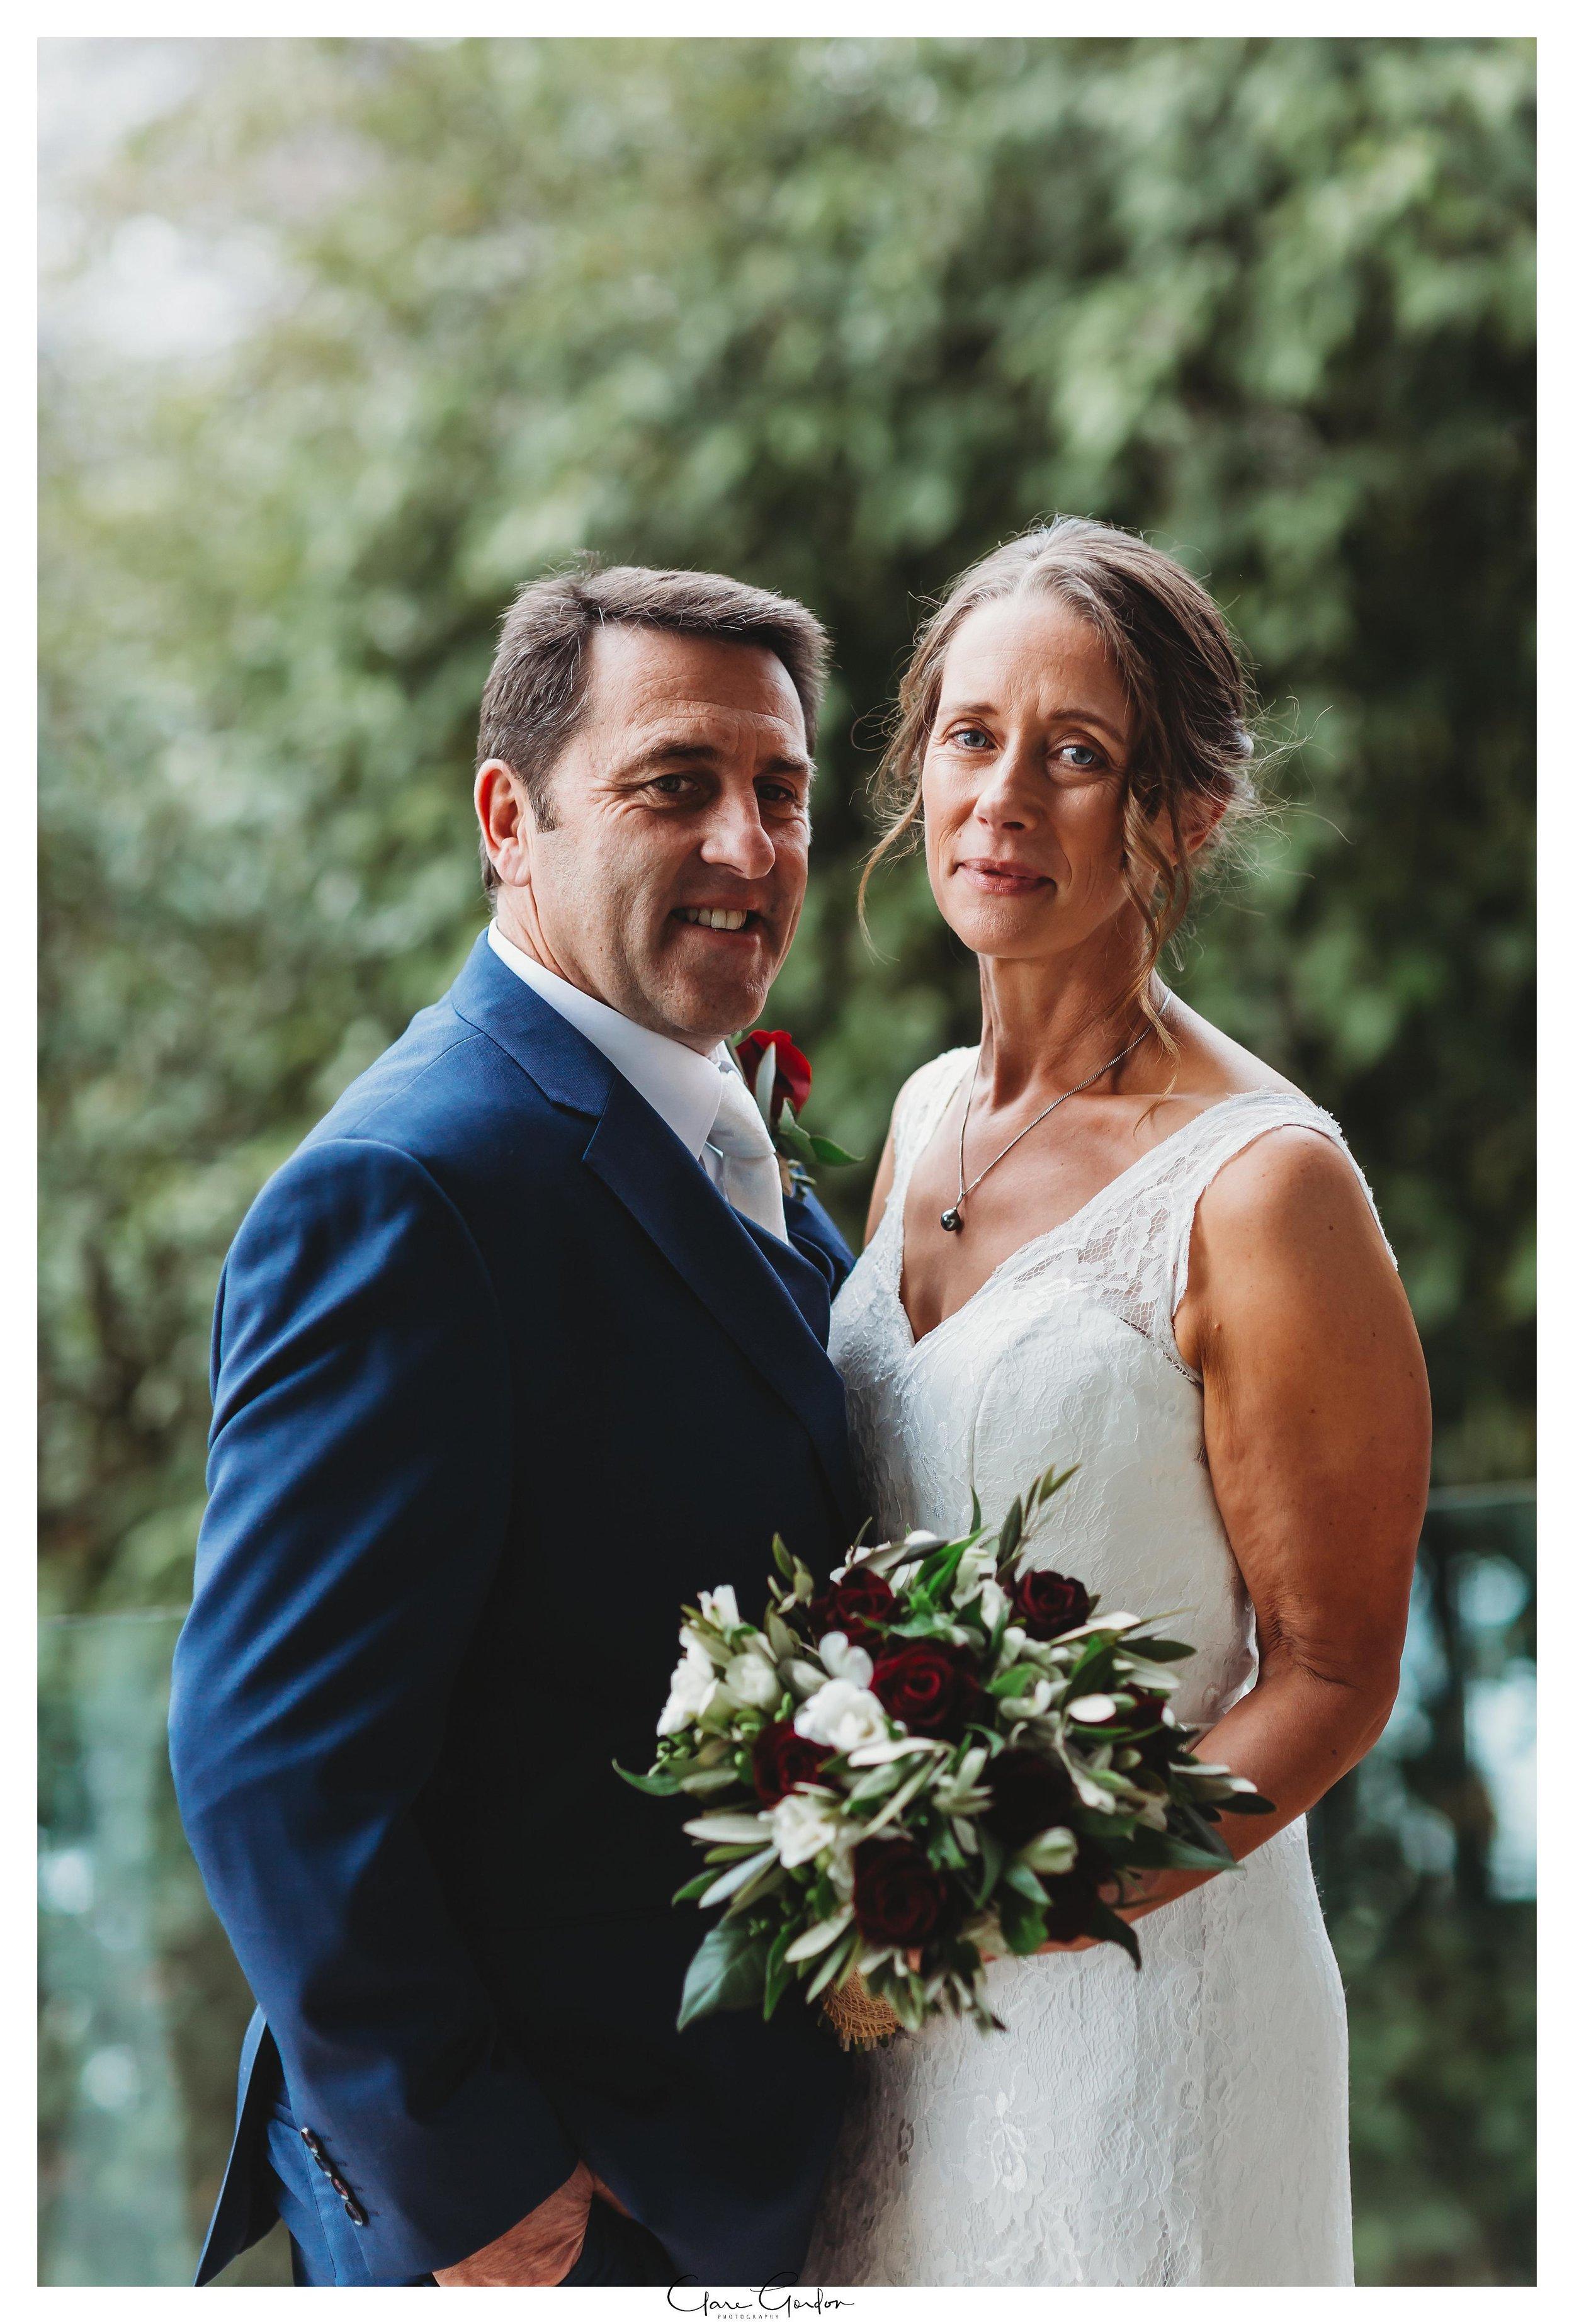 Hamilton-NZ-wedding-photographer-Bride-reflection-Waikato-wedding-photographer-Novotel-Hamilton-Clare-Gordon-photography (23).jpg